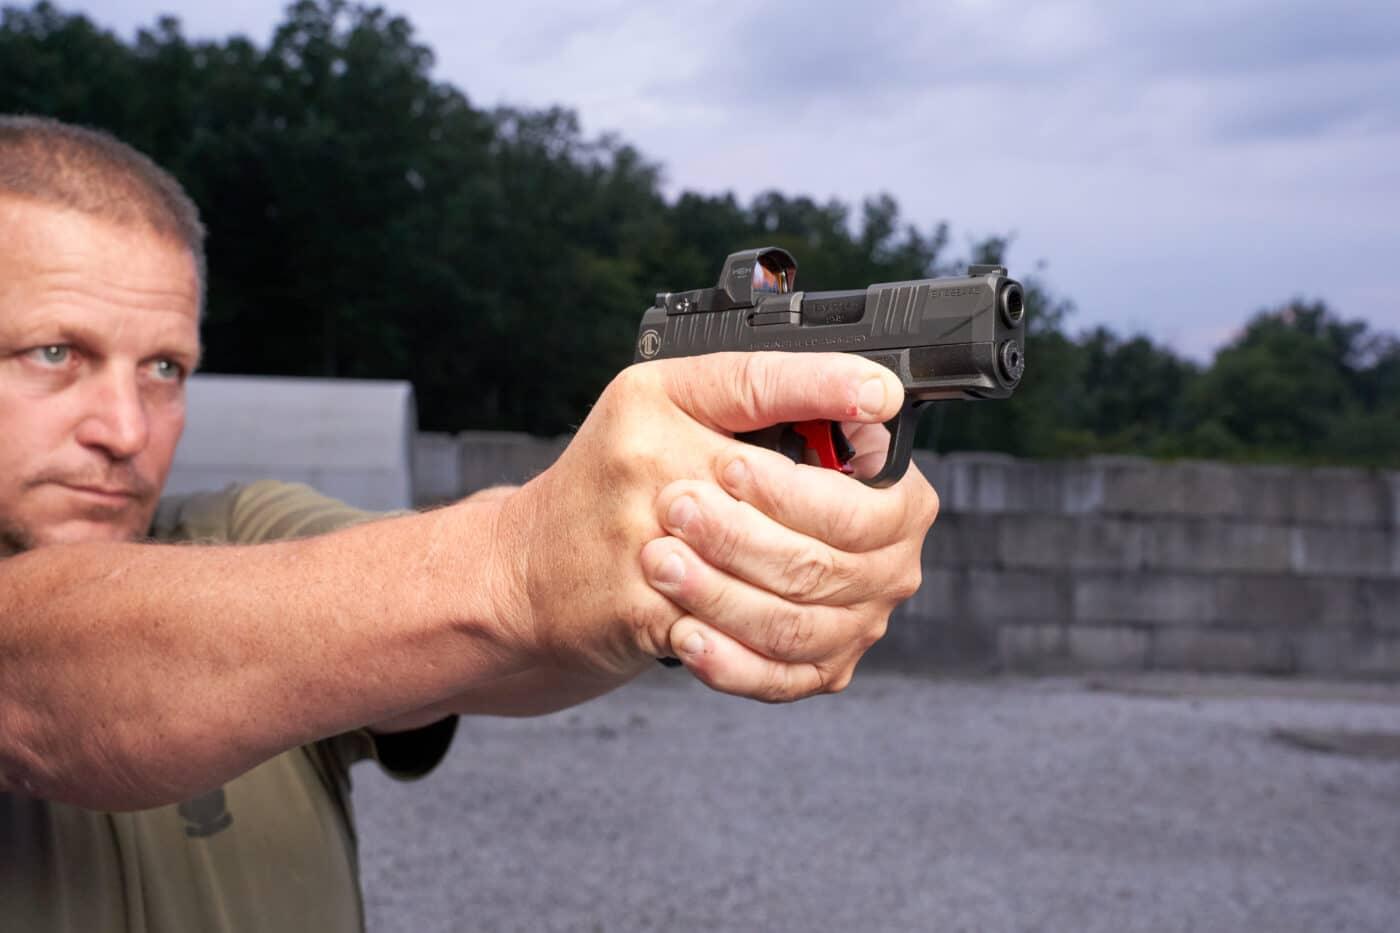 Man shooting custom Hellcat with red dot sights